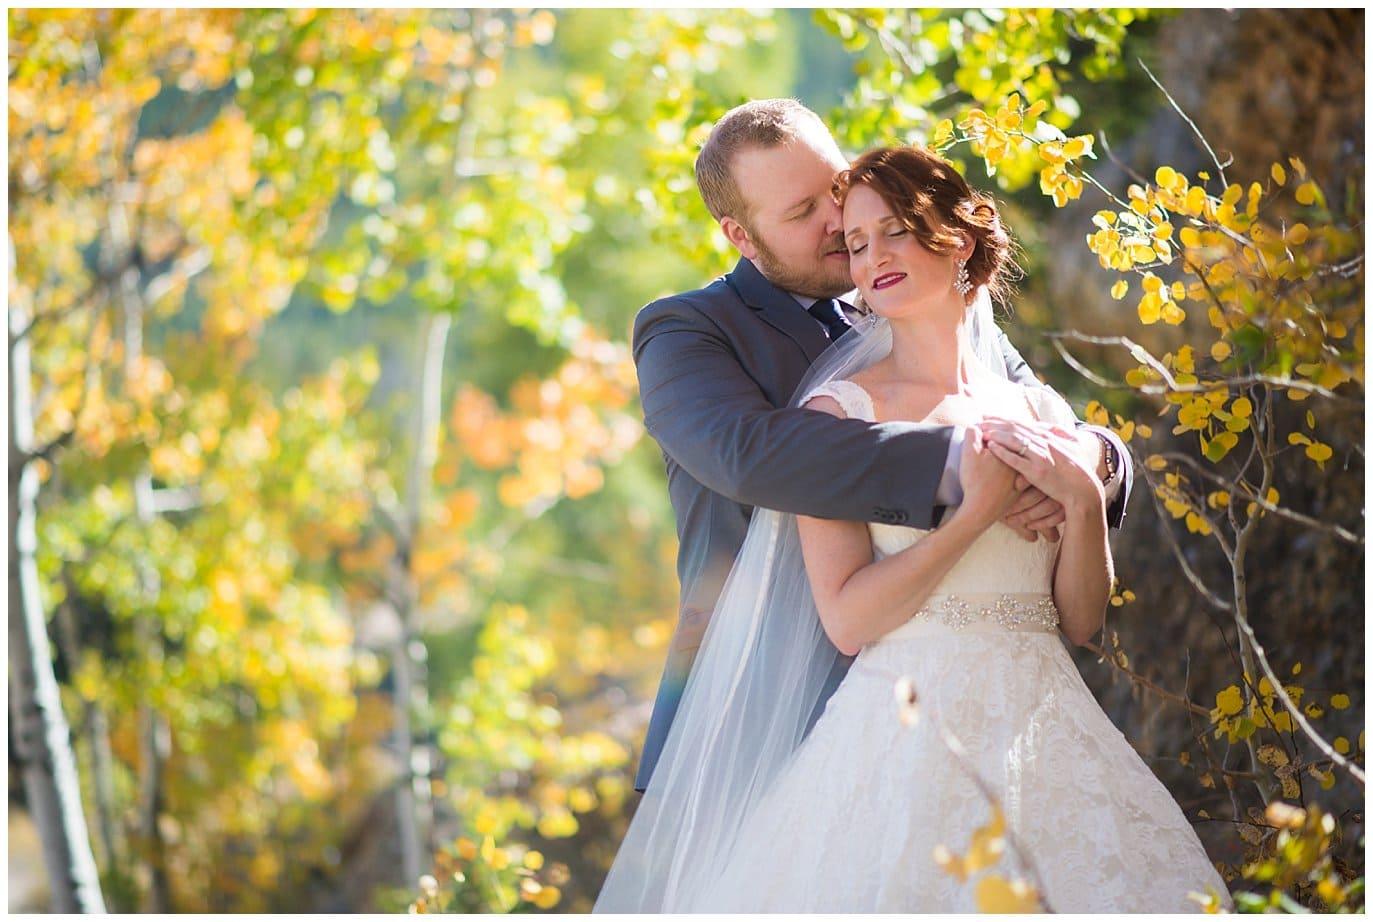 Boettcher Mansion Frostburg Park wedding couples photo